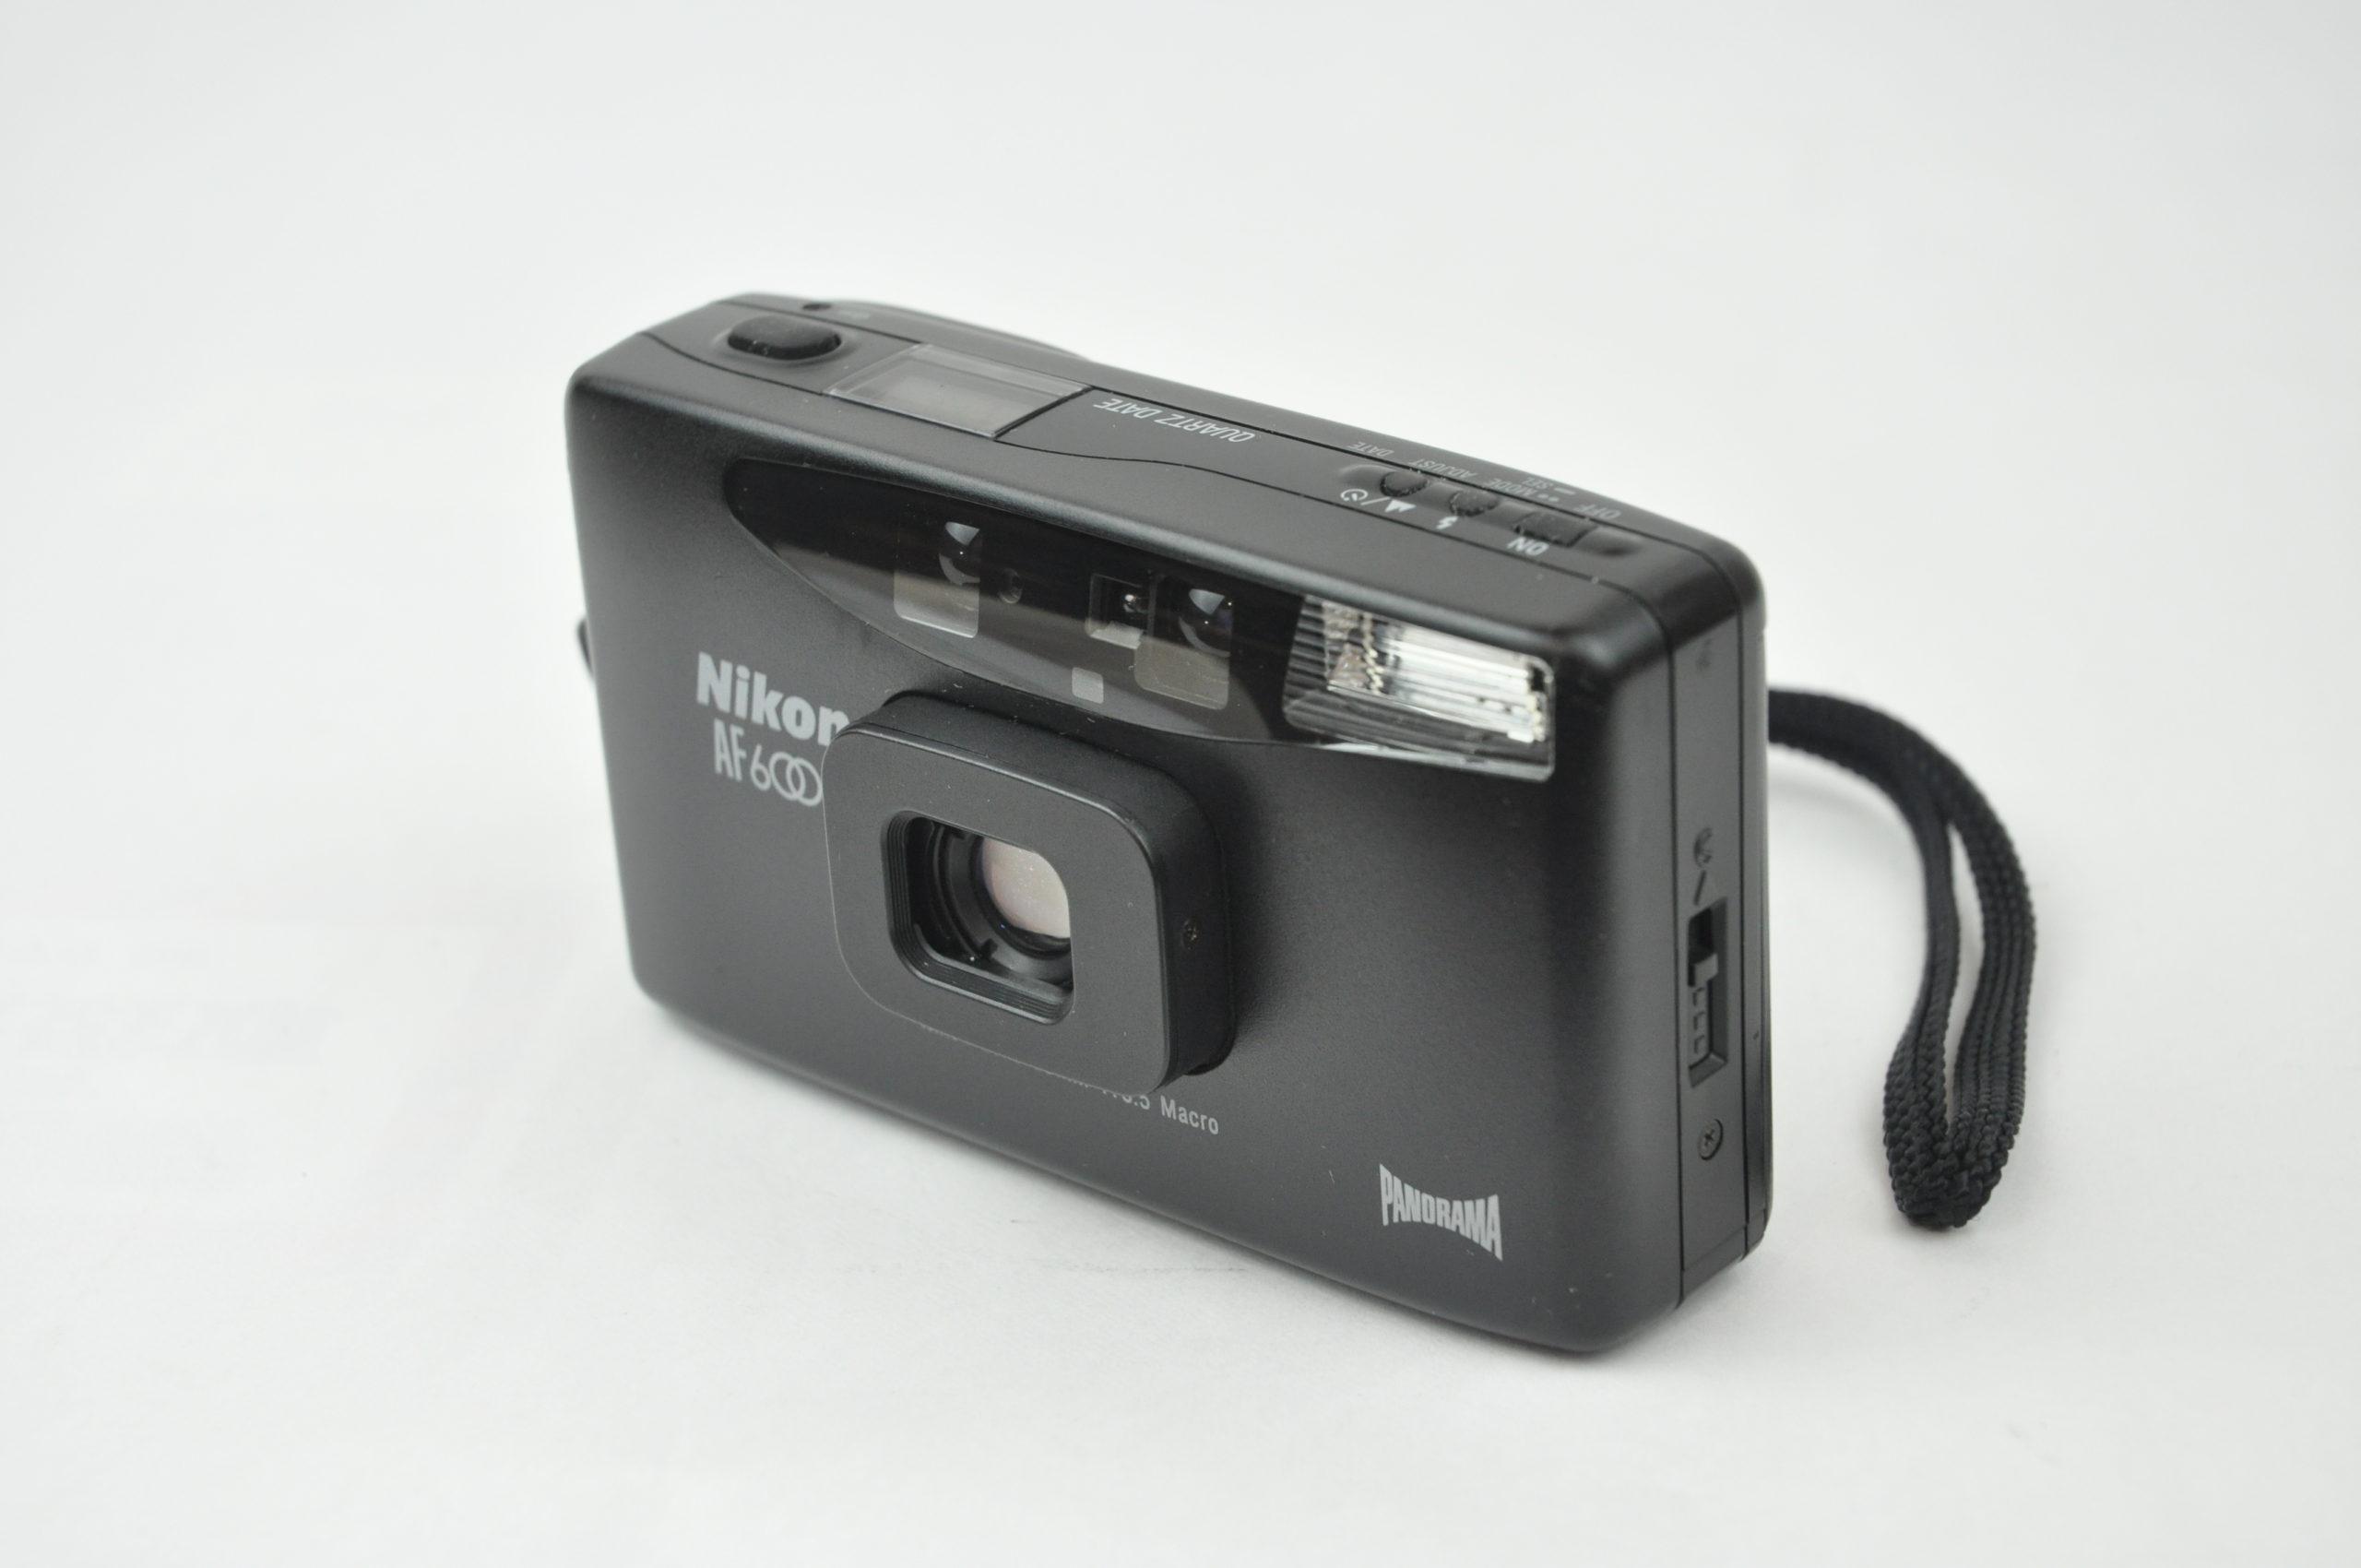 Nikon AF600 QUARTZ DATE